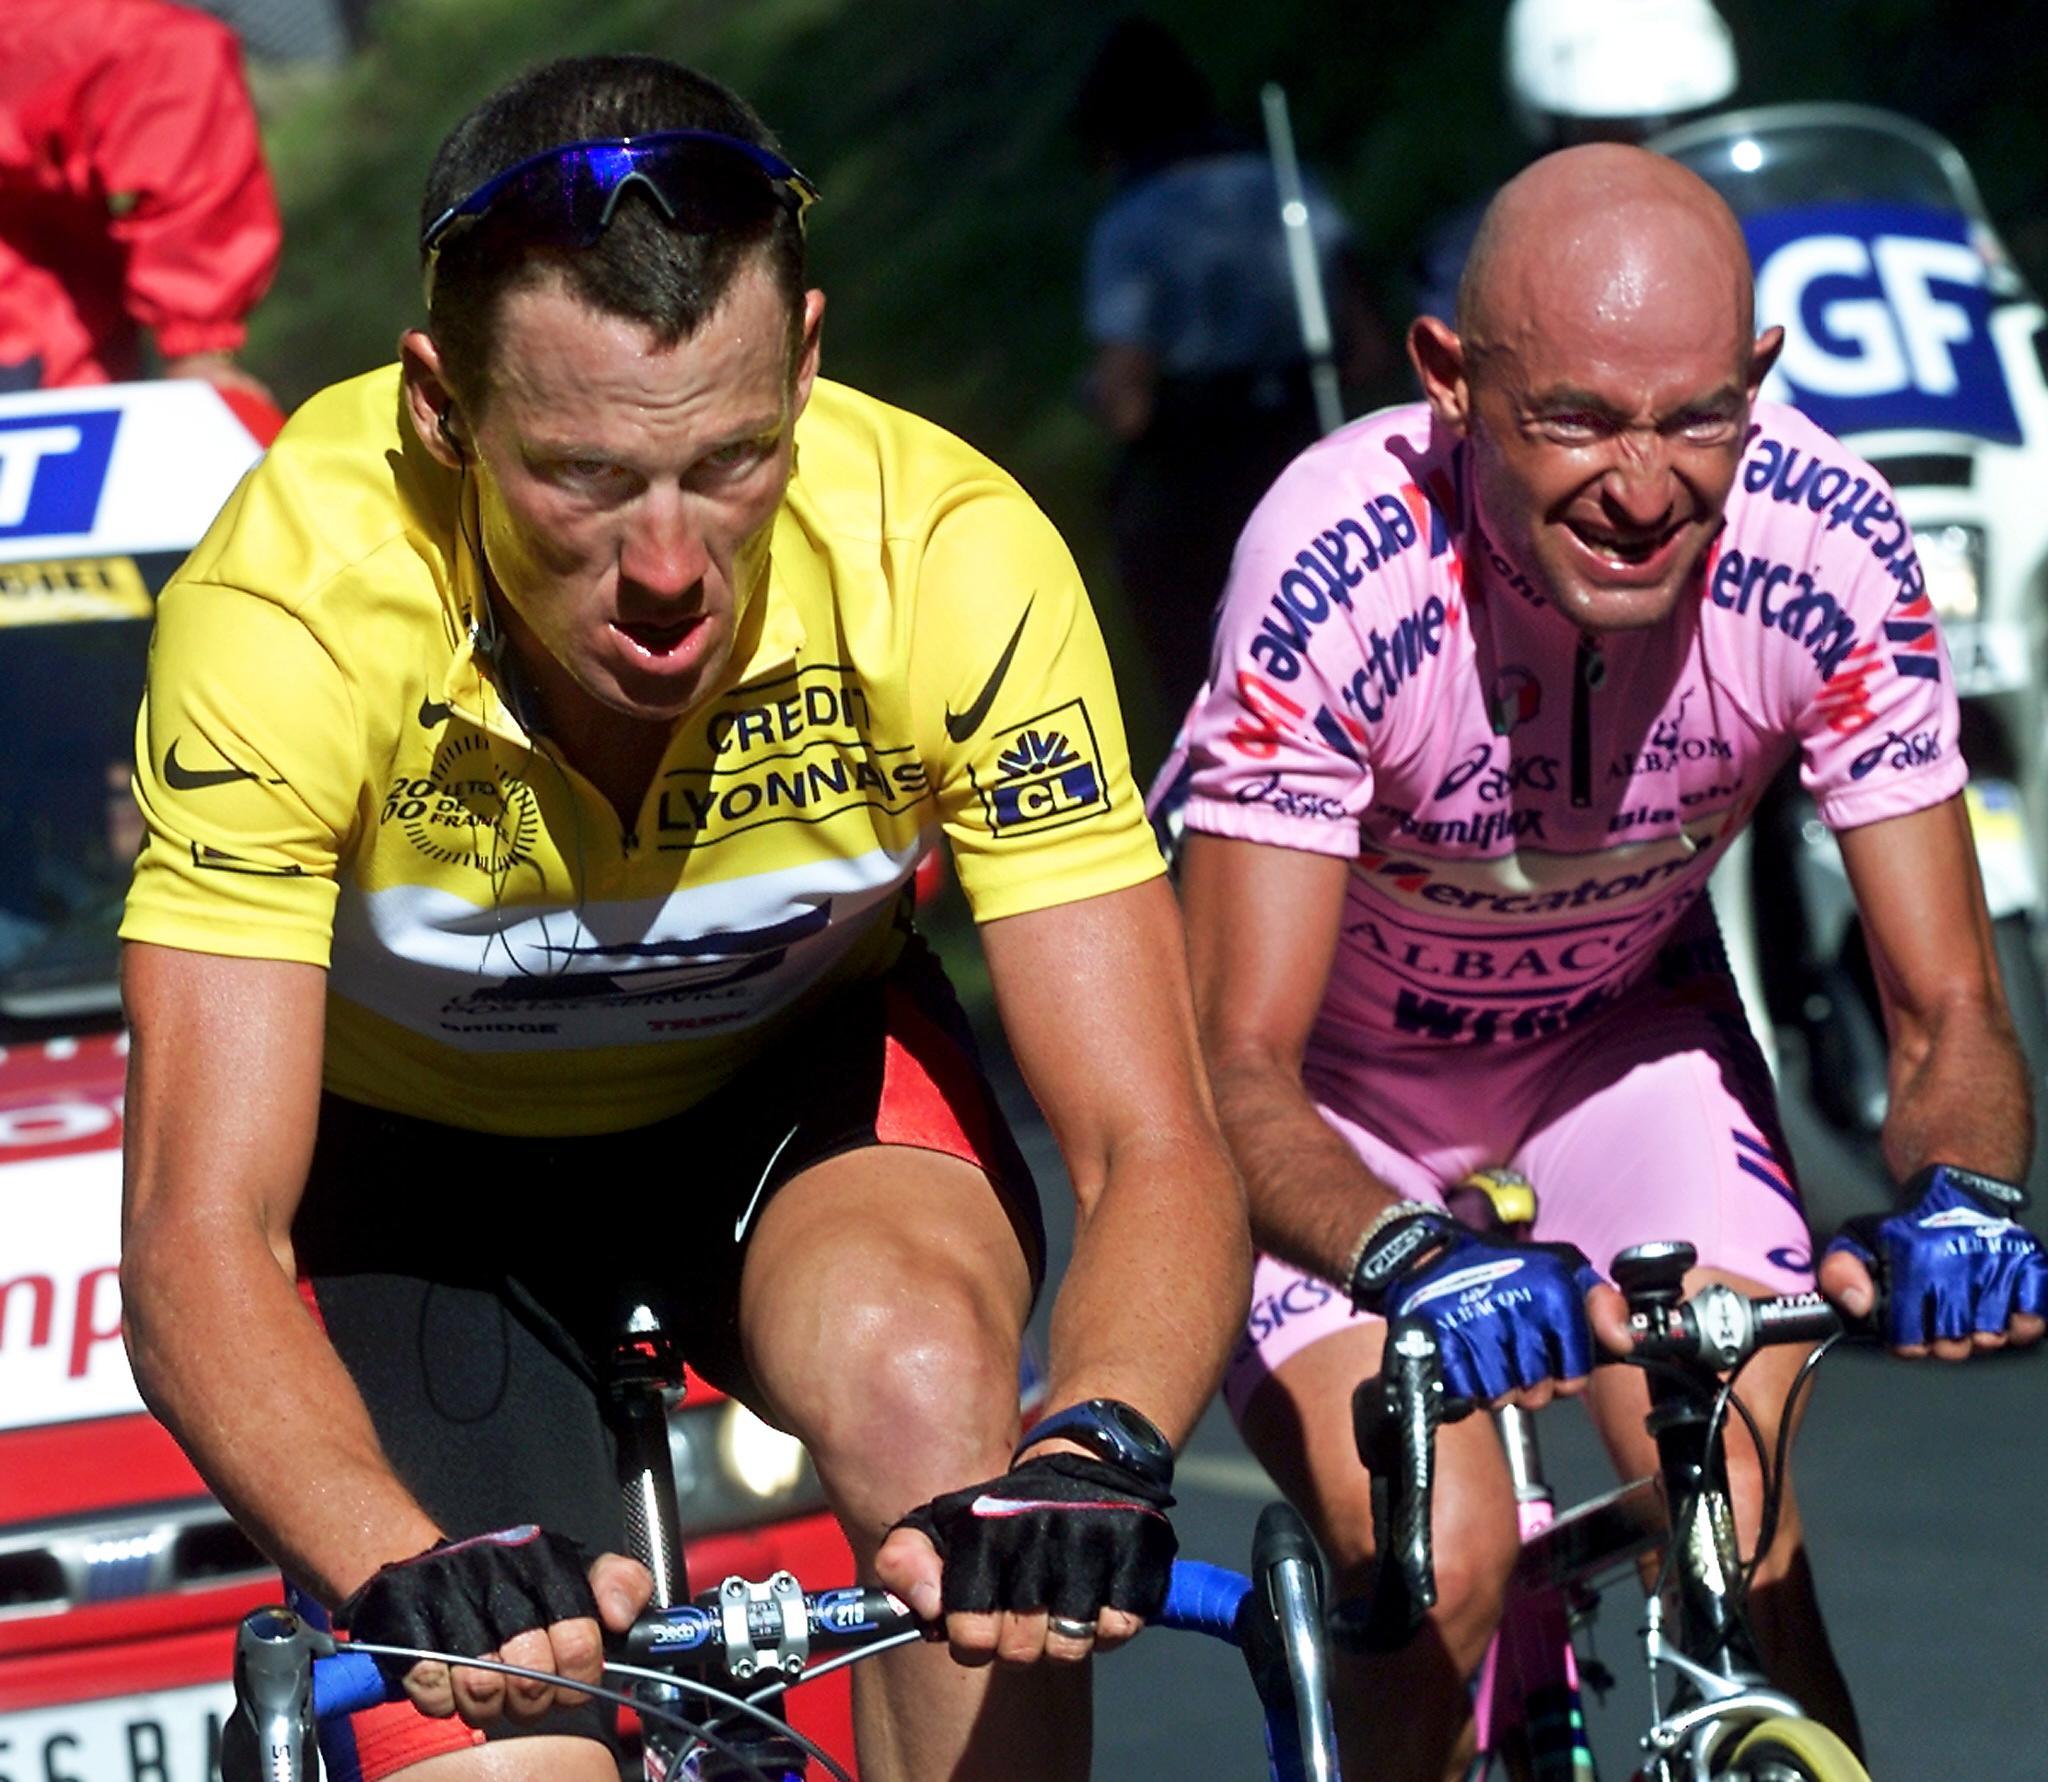 Lance and Pantani